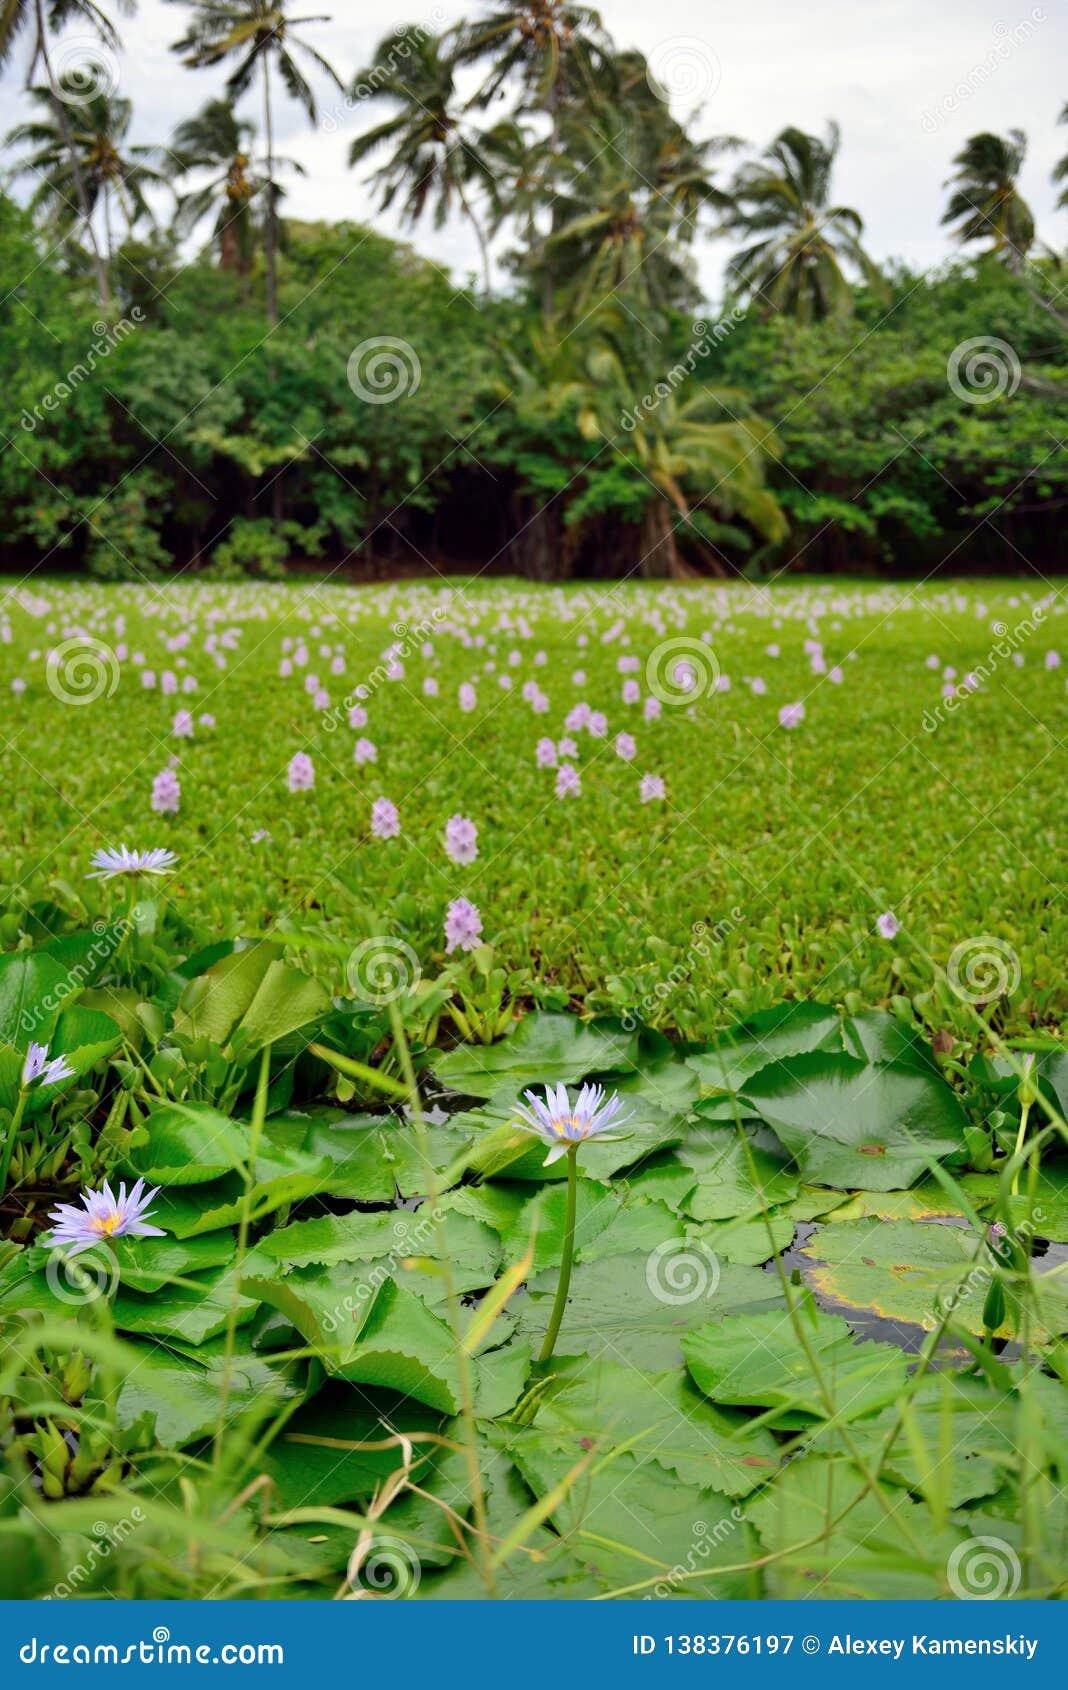 Lilies on the tropical lake in Hawaii Big Island